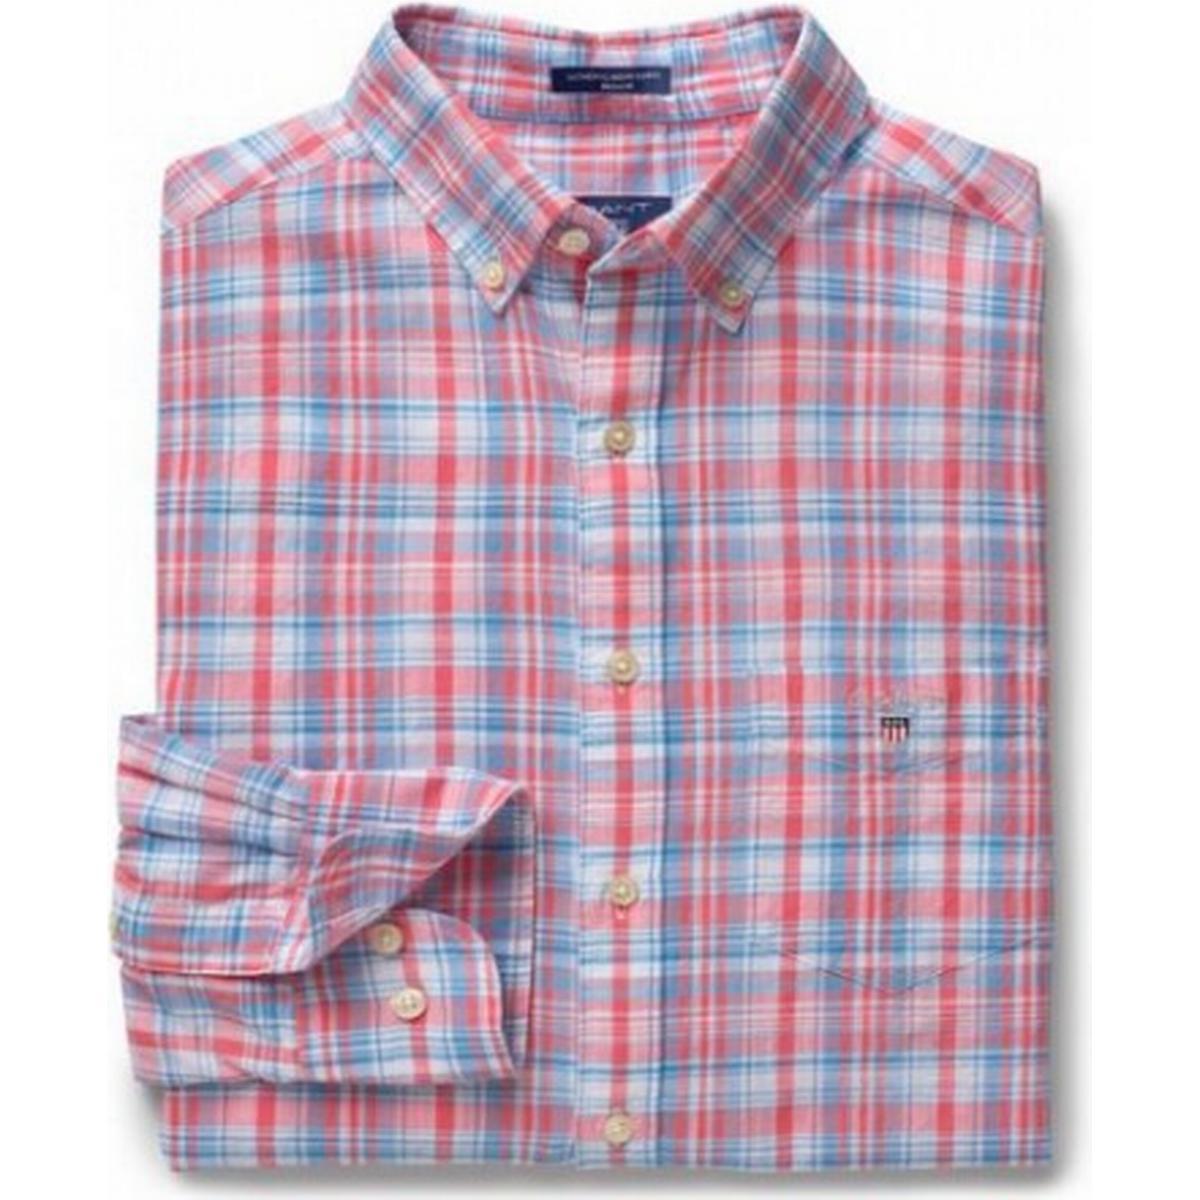 a2230d552eee Gant Skjortor Herrkläder - Jämför priser på shirts PriceRunner